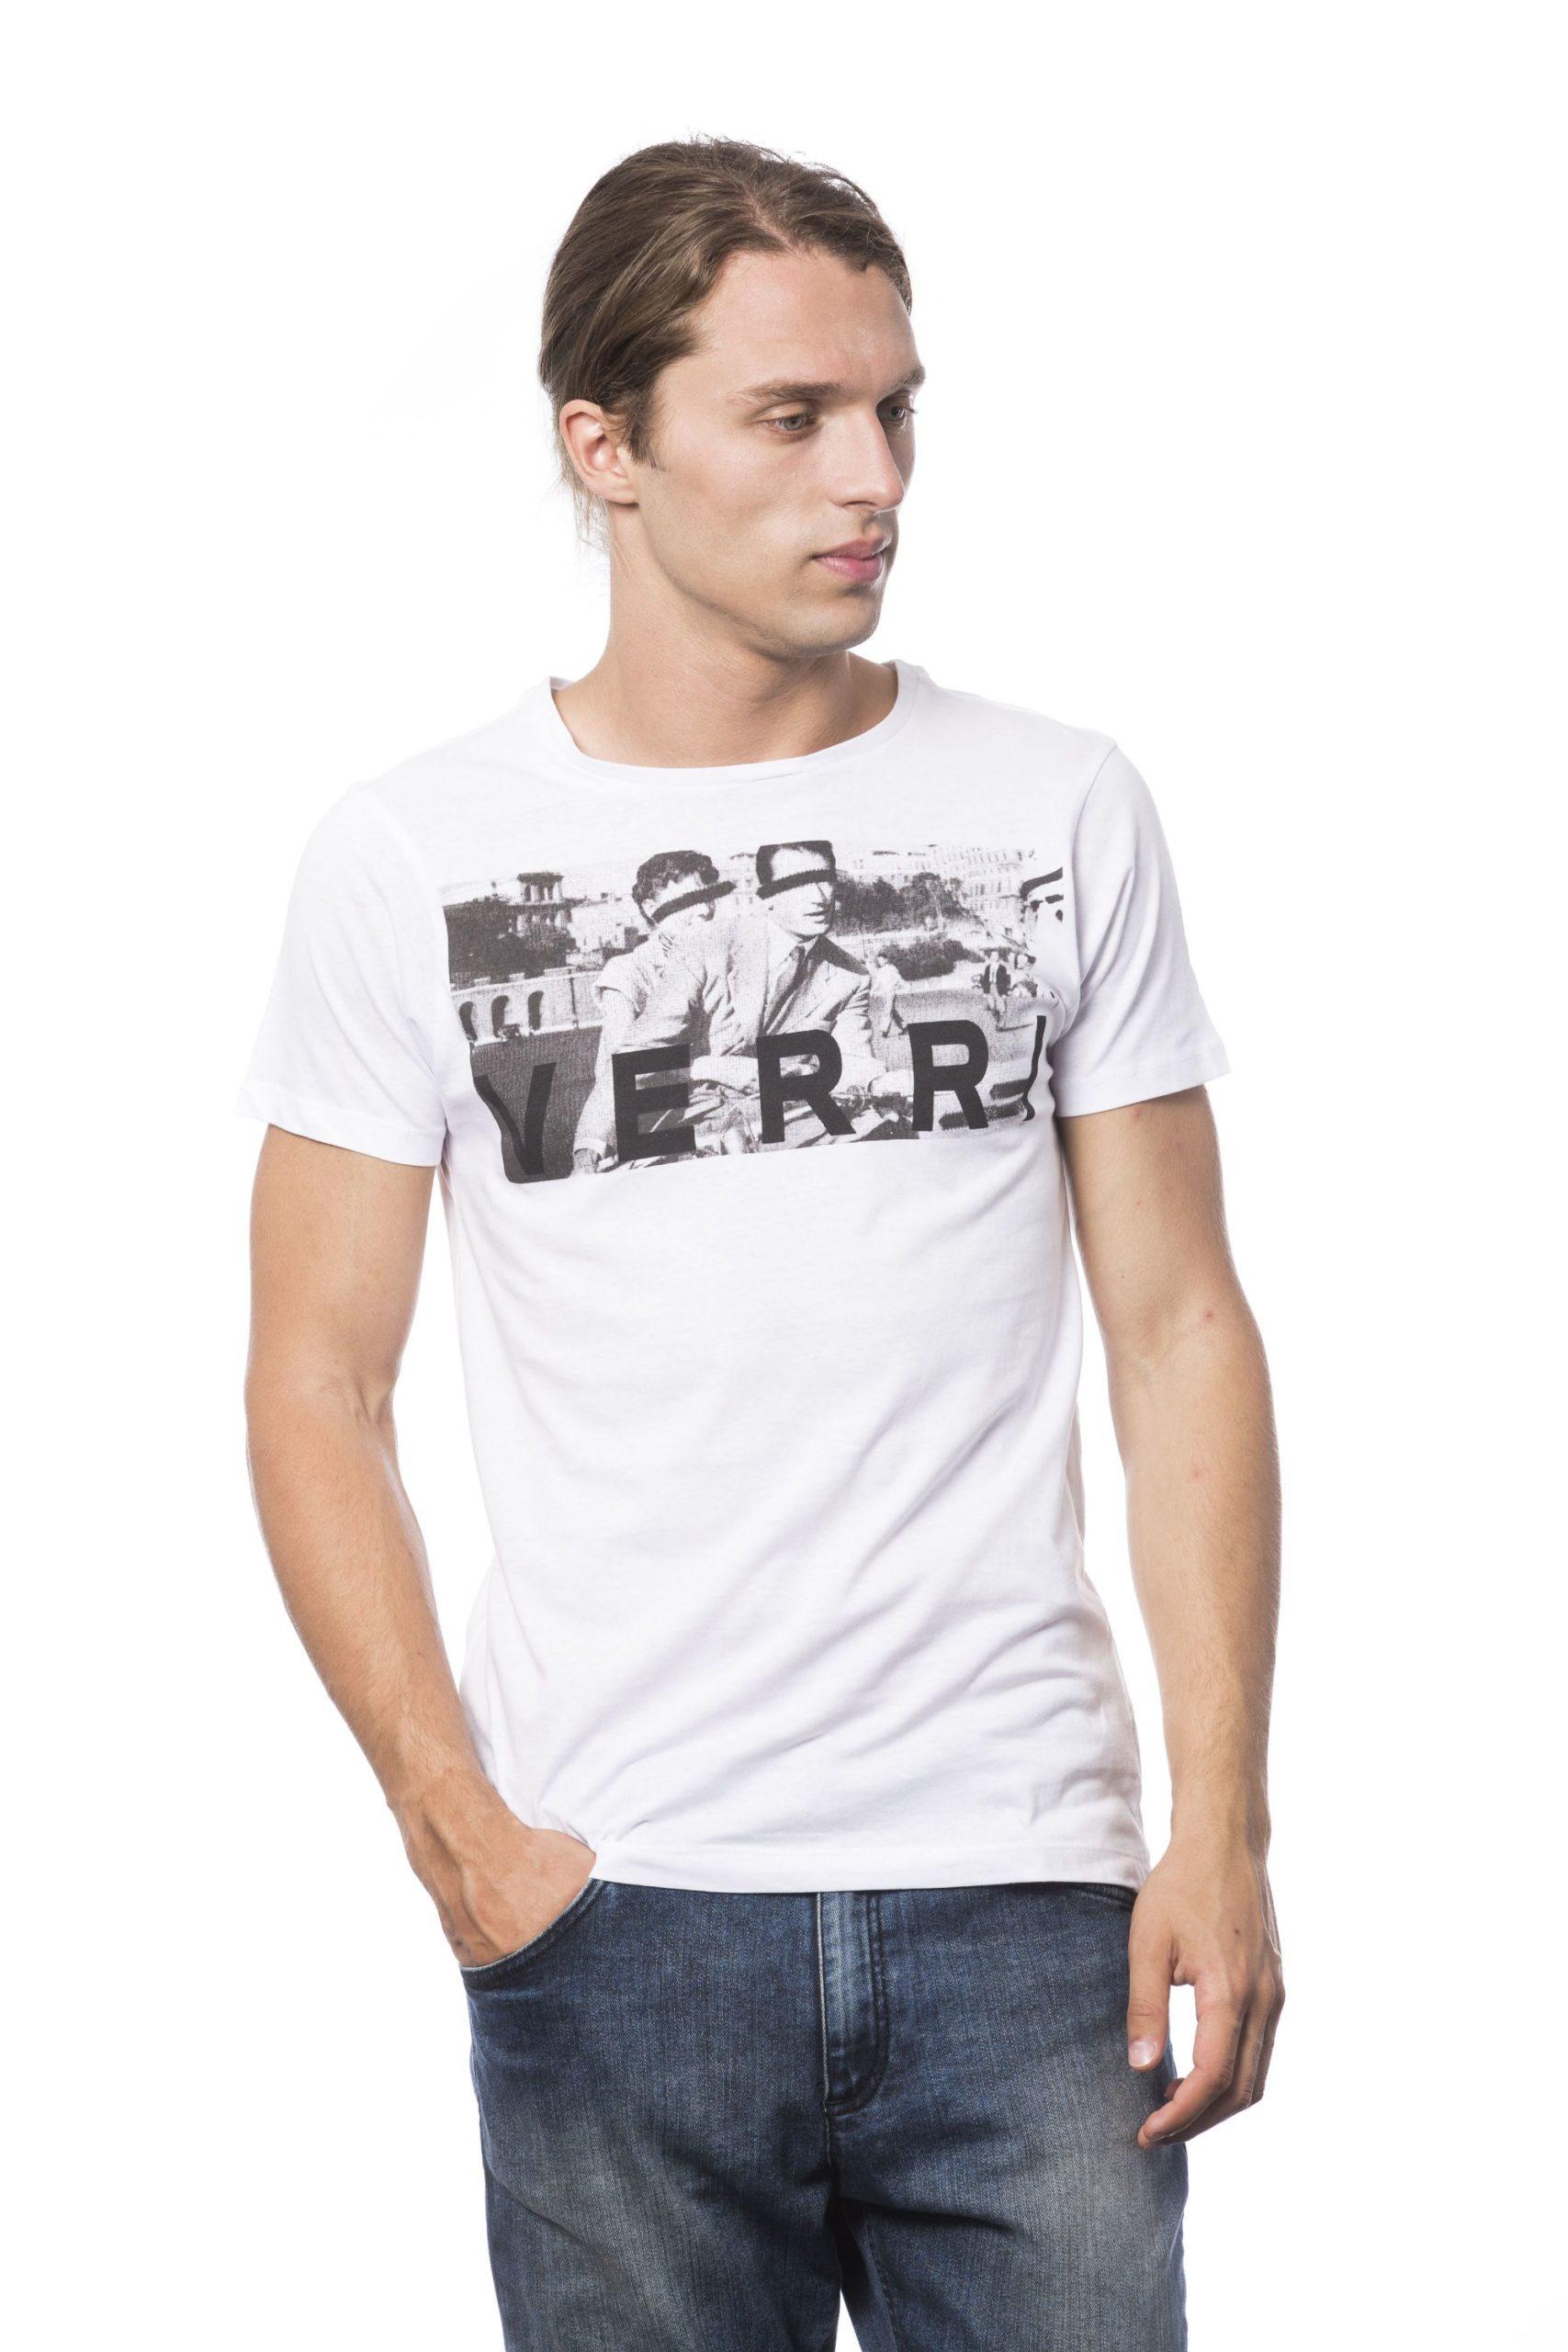 Verri Men's Bianco T-Shirt White VE682808 - S